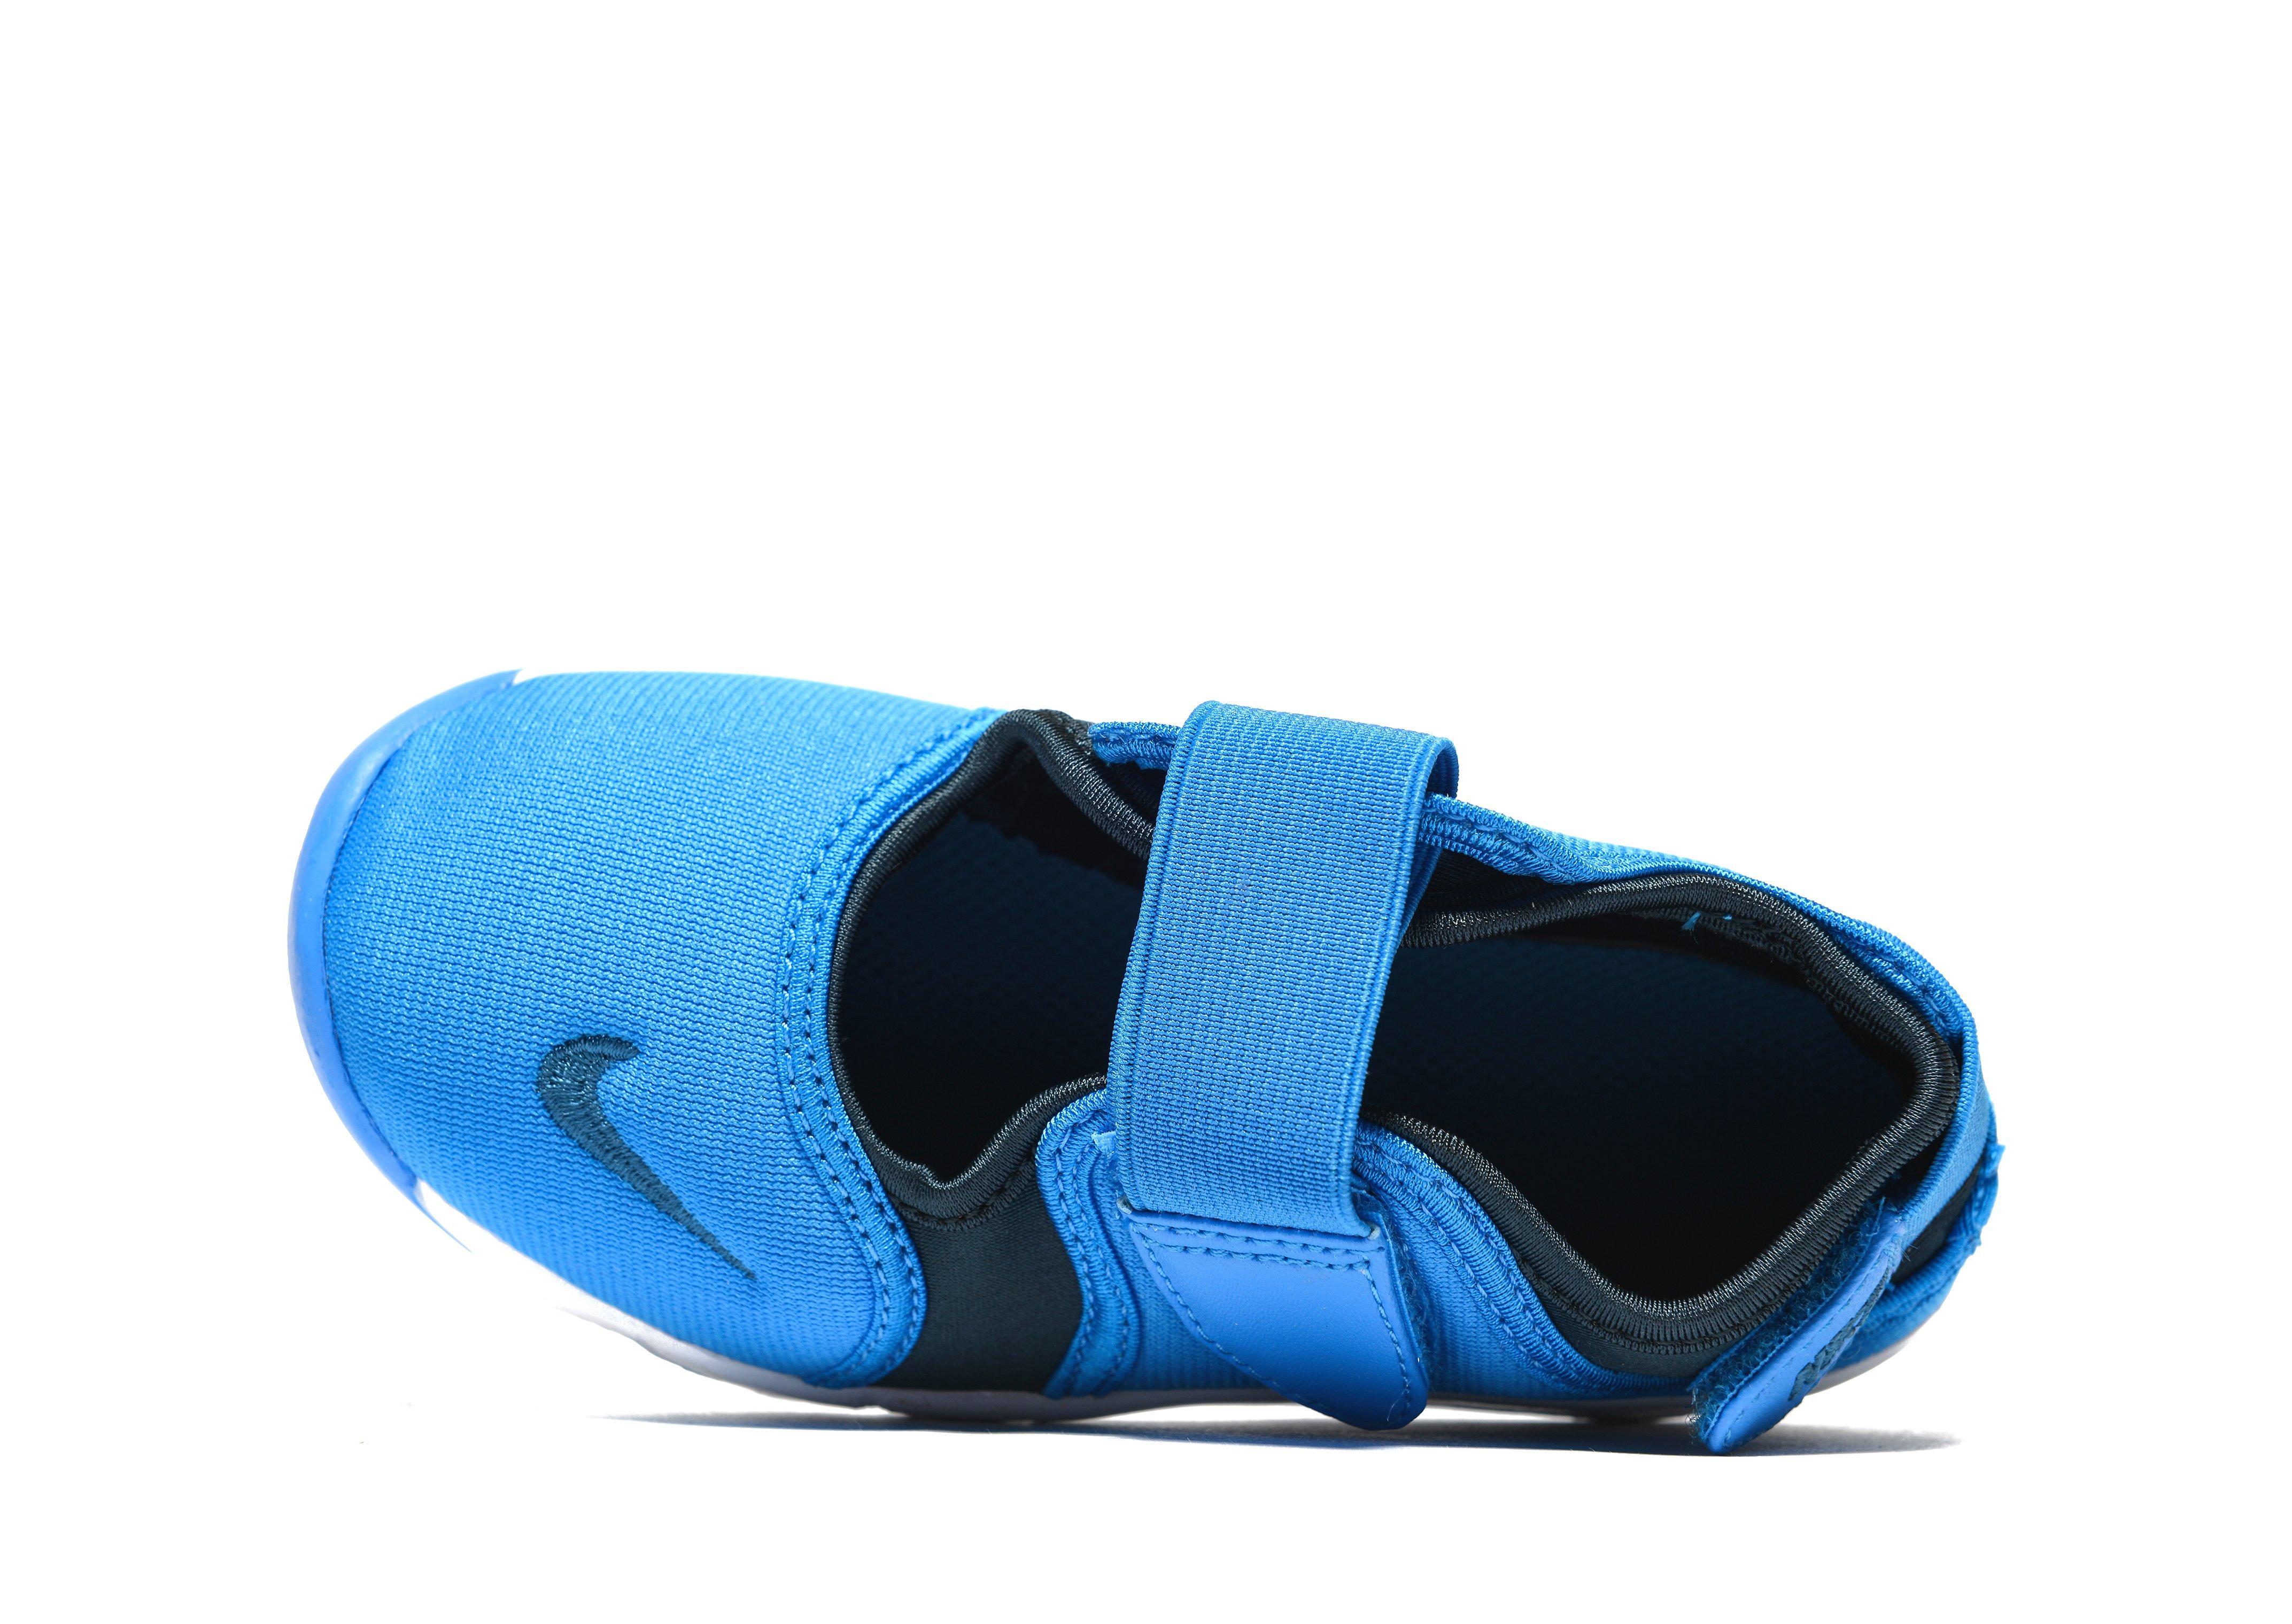 827cea22 Nike Dunk Sb Gucci Tie Dyeing Vans | HopShopGo